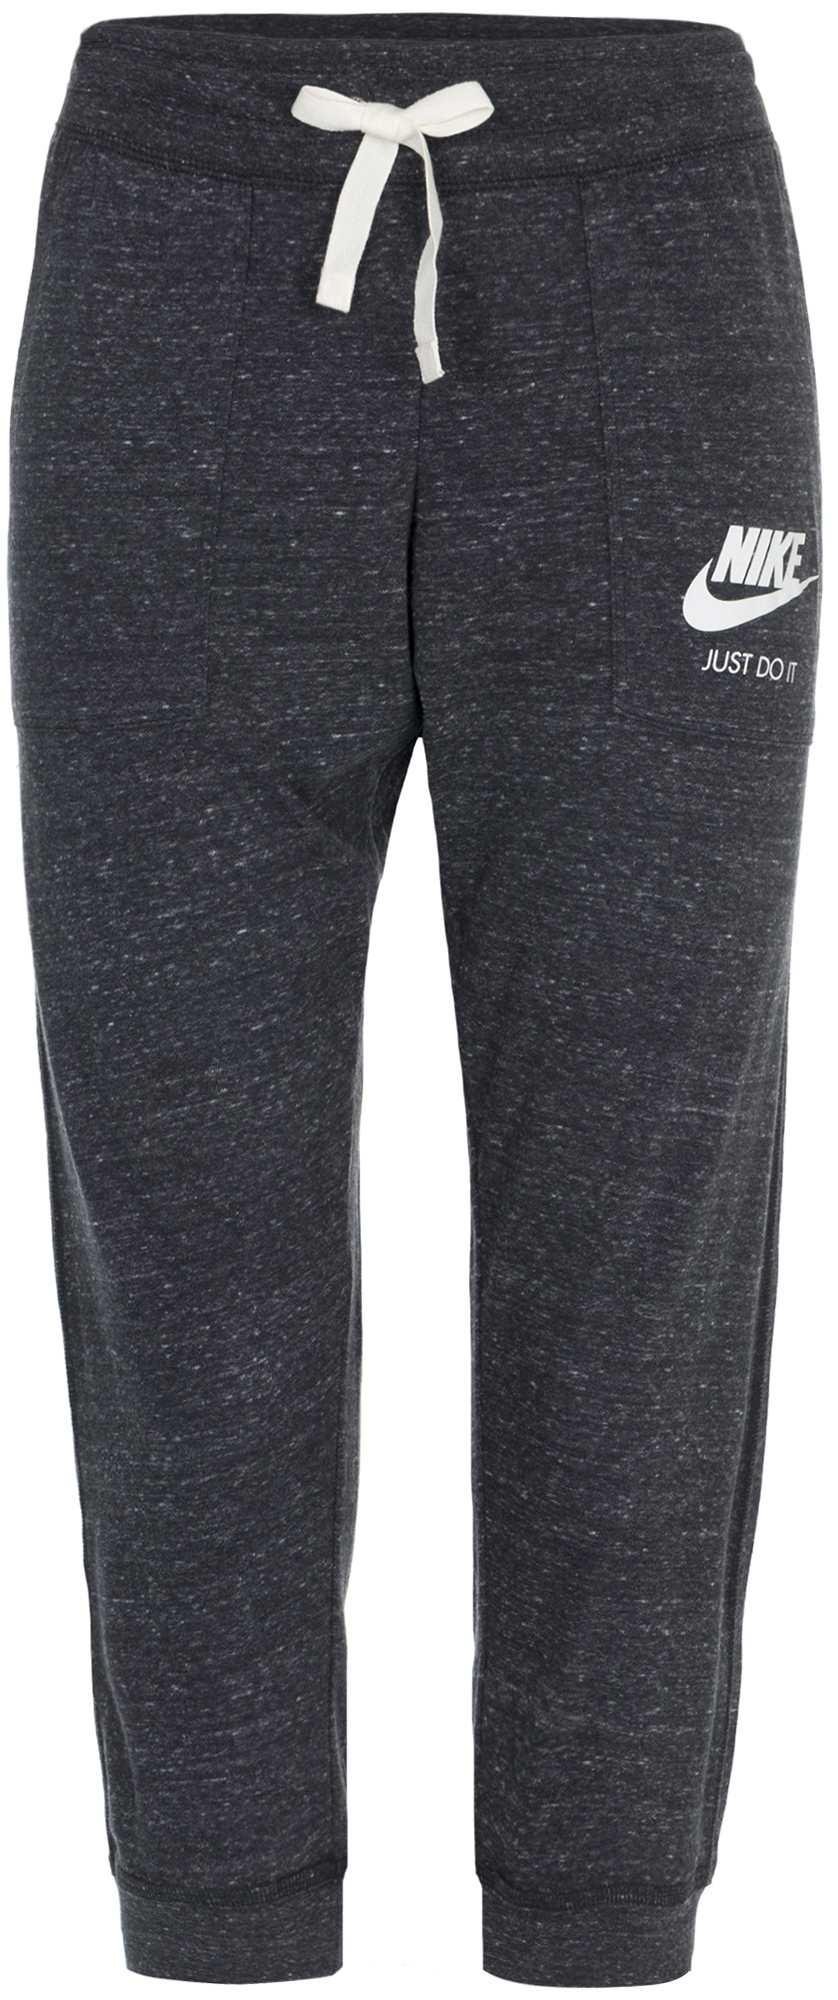 Nike Бриджи женские Nike Sportswear Vintage, размер 40-42